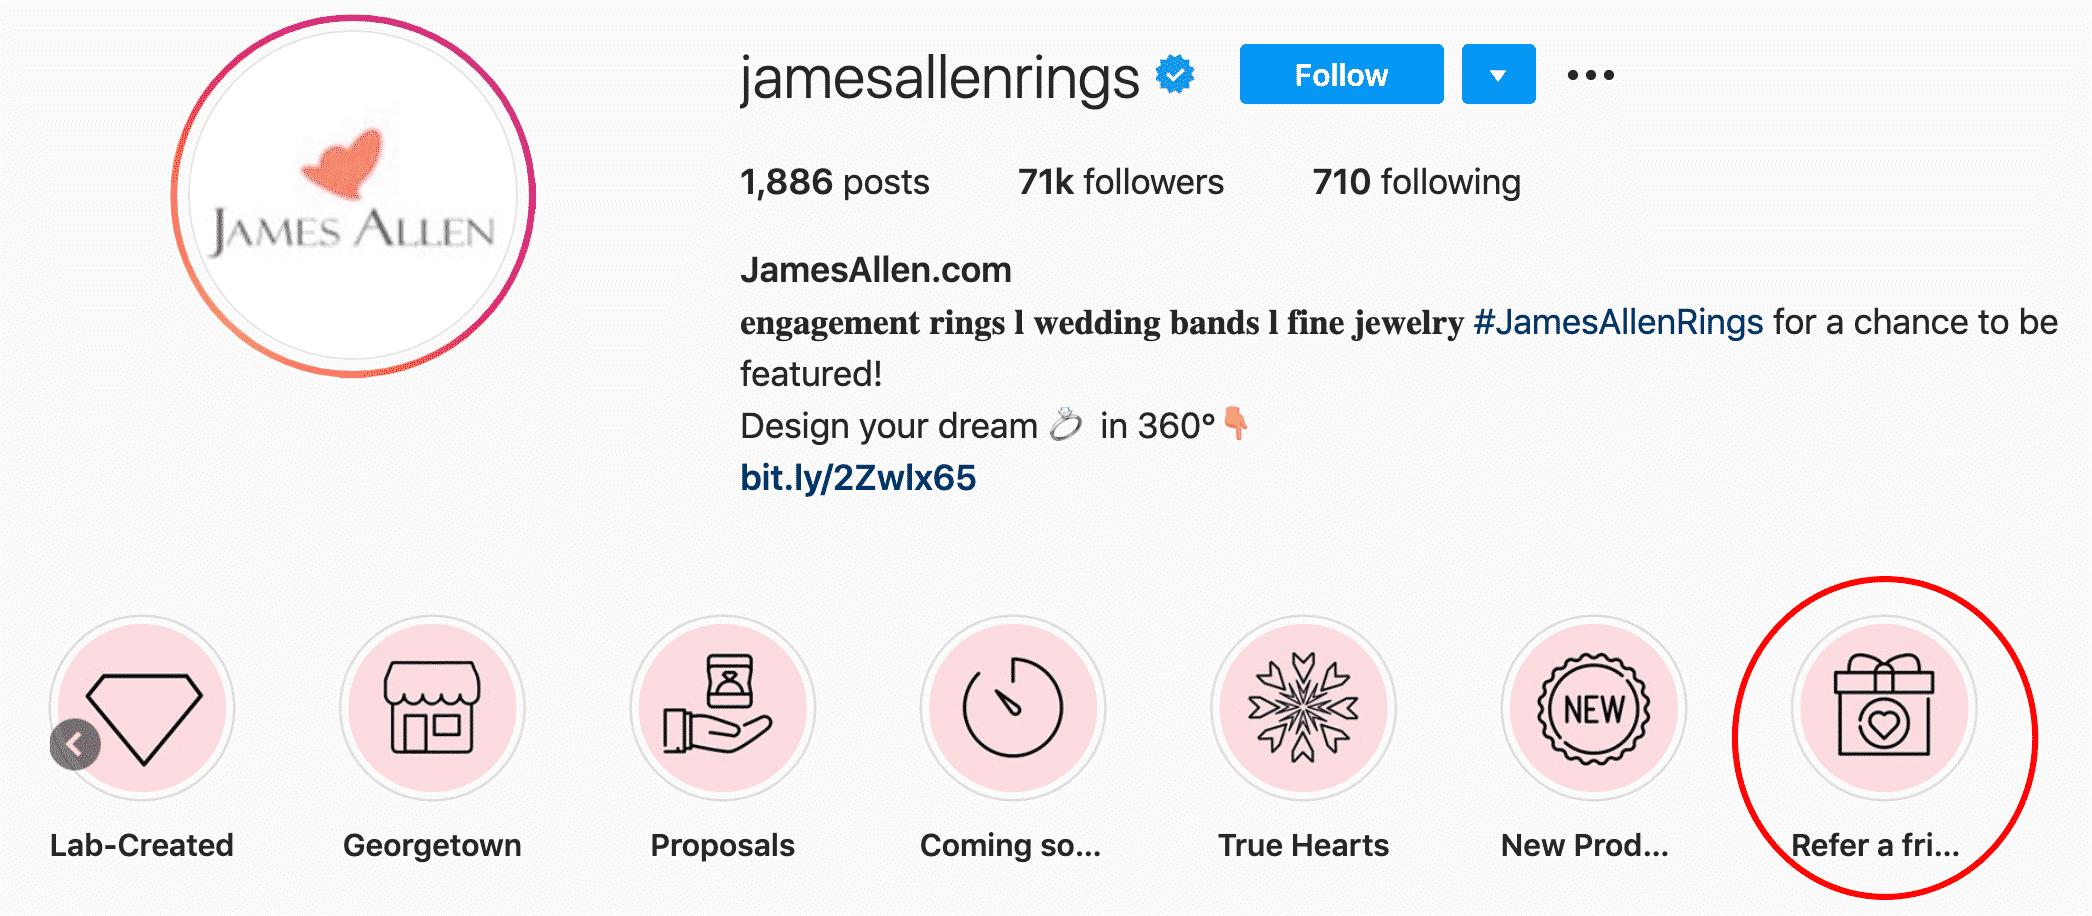 JamesAllen Instagram profile showcases referral program